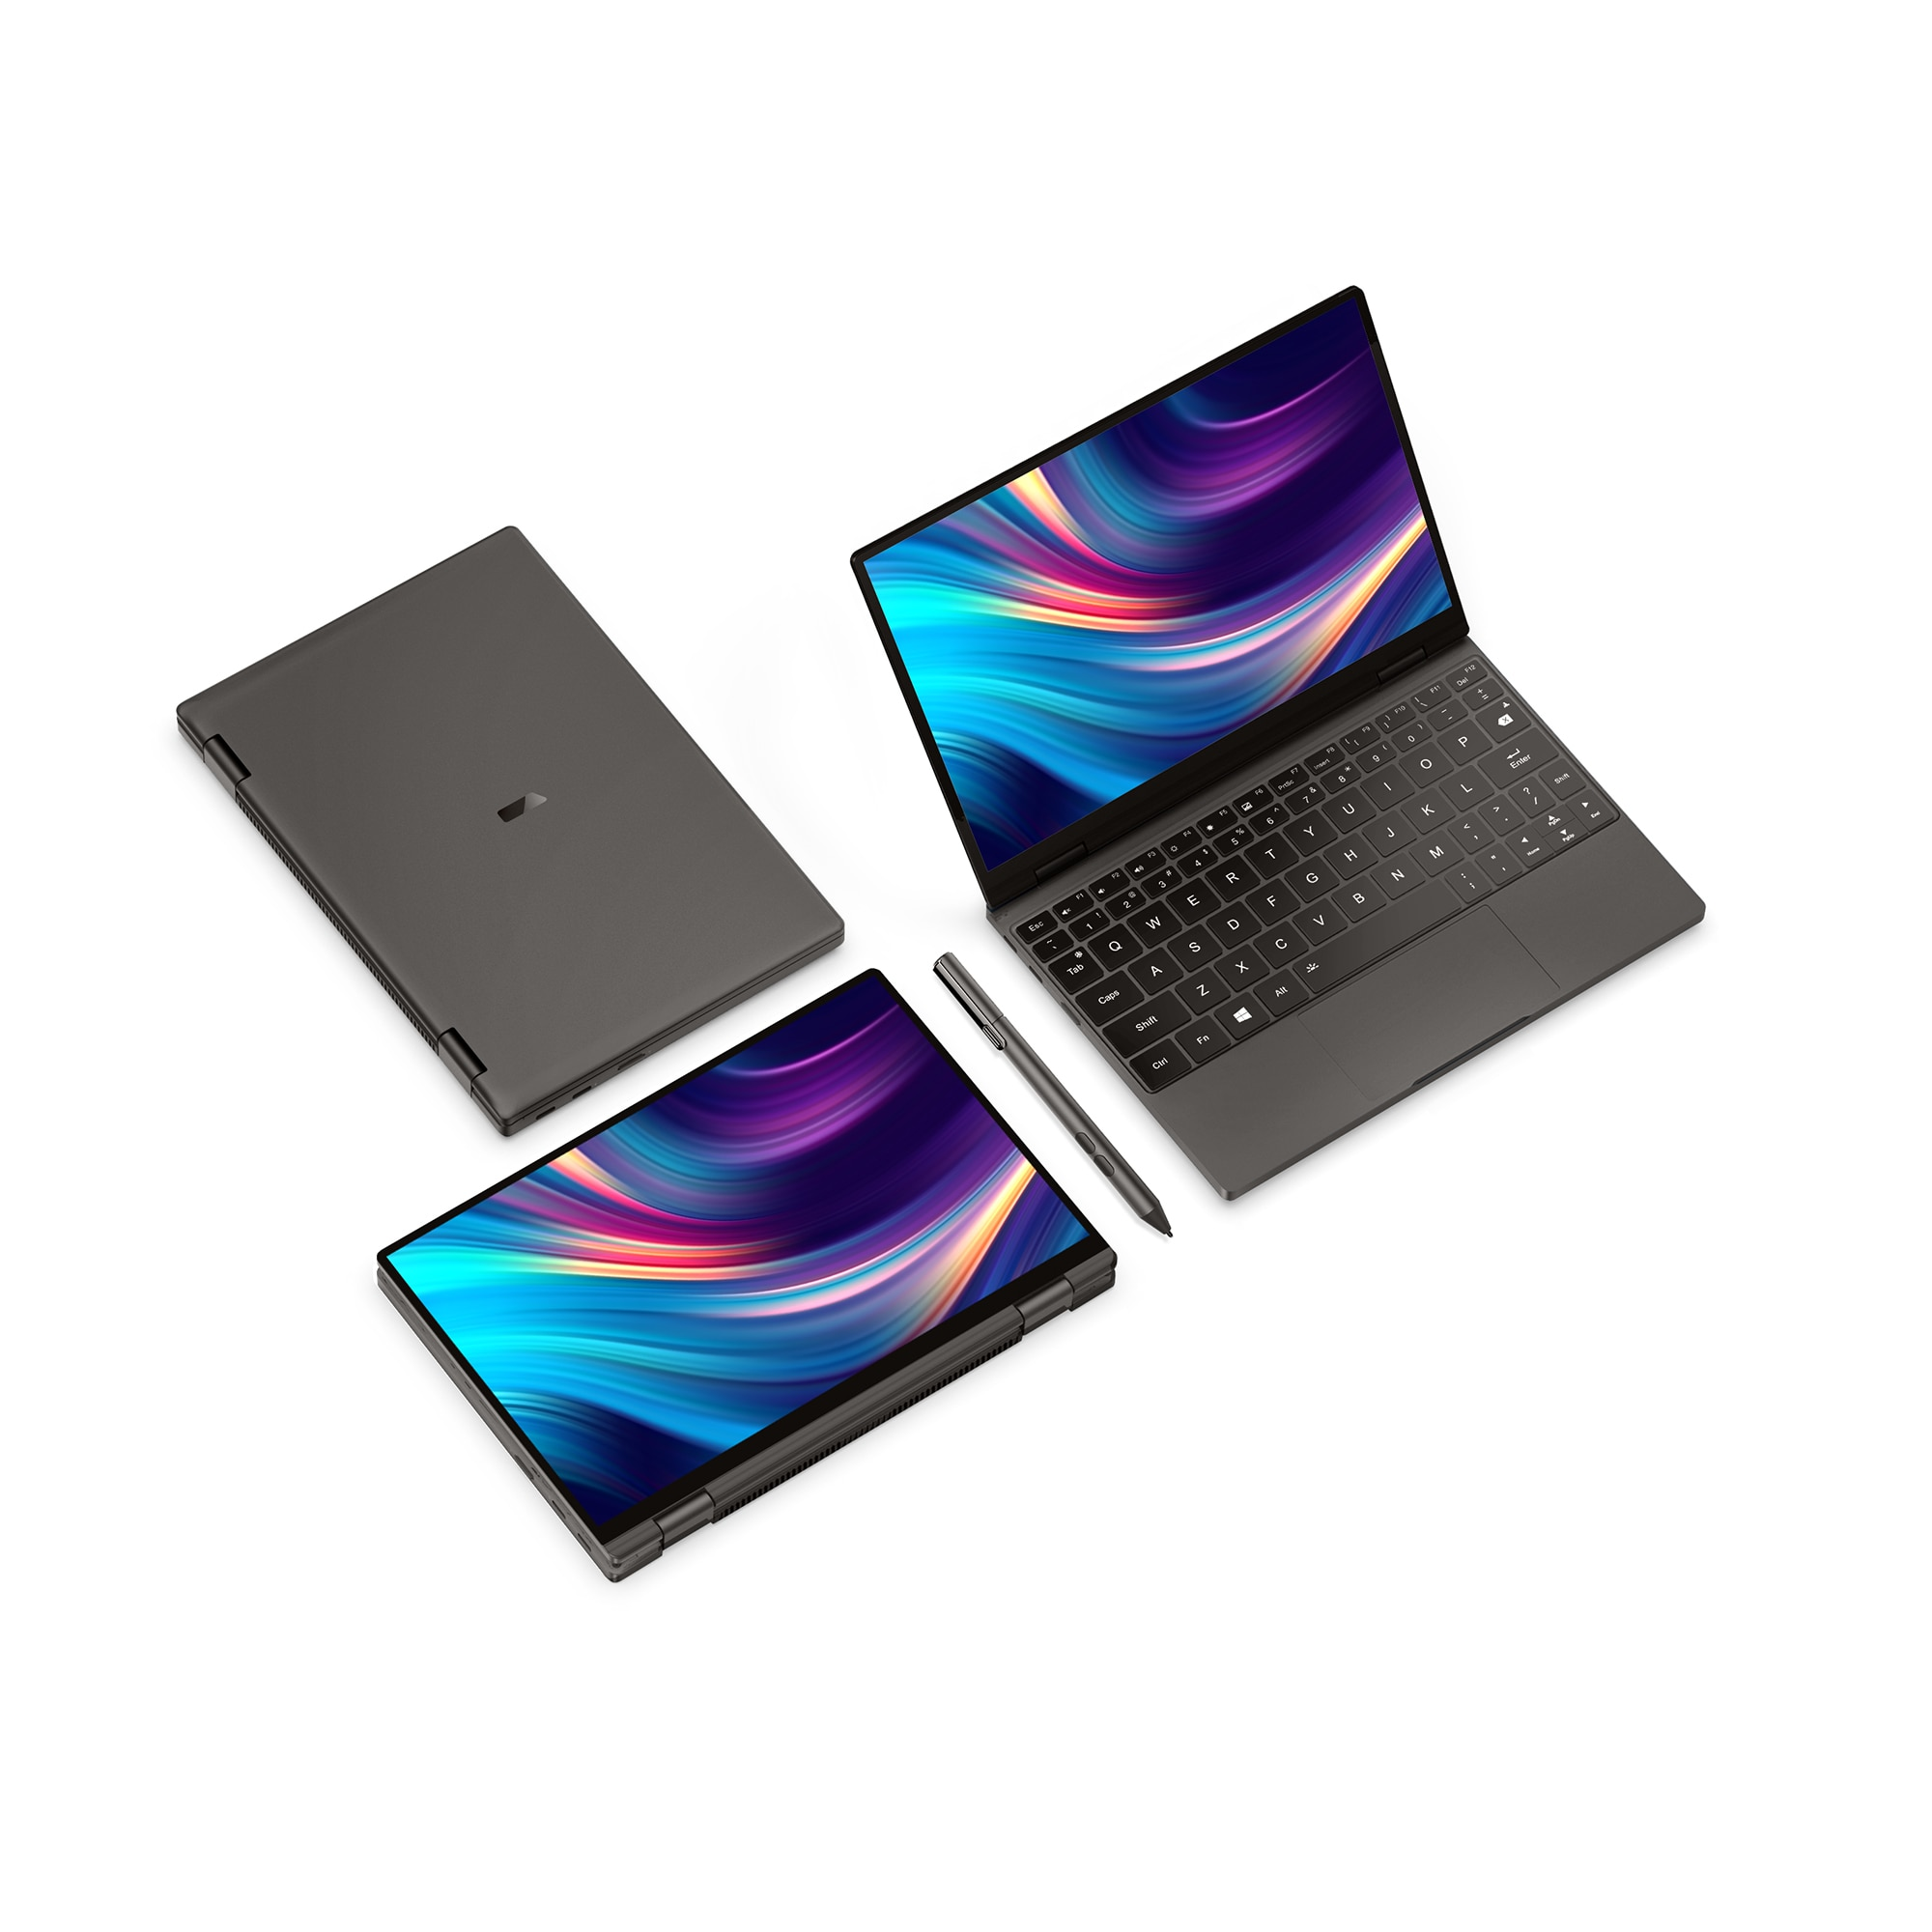 One-Notebook 10.1 Inch Pocket Computer OneMix4 Platinum Netbook i7-1160g7 16G RAM 512GB SSD IPS Touch Screen Windows